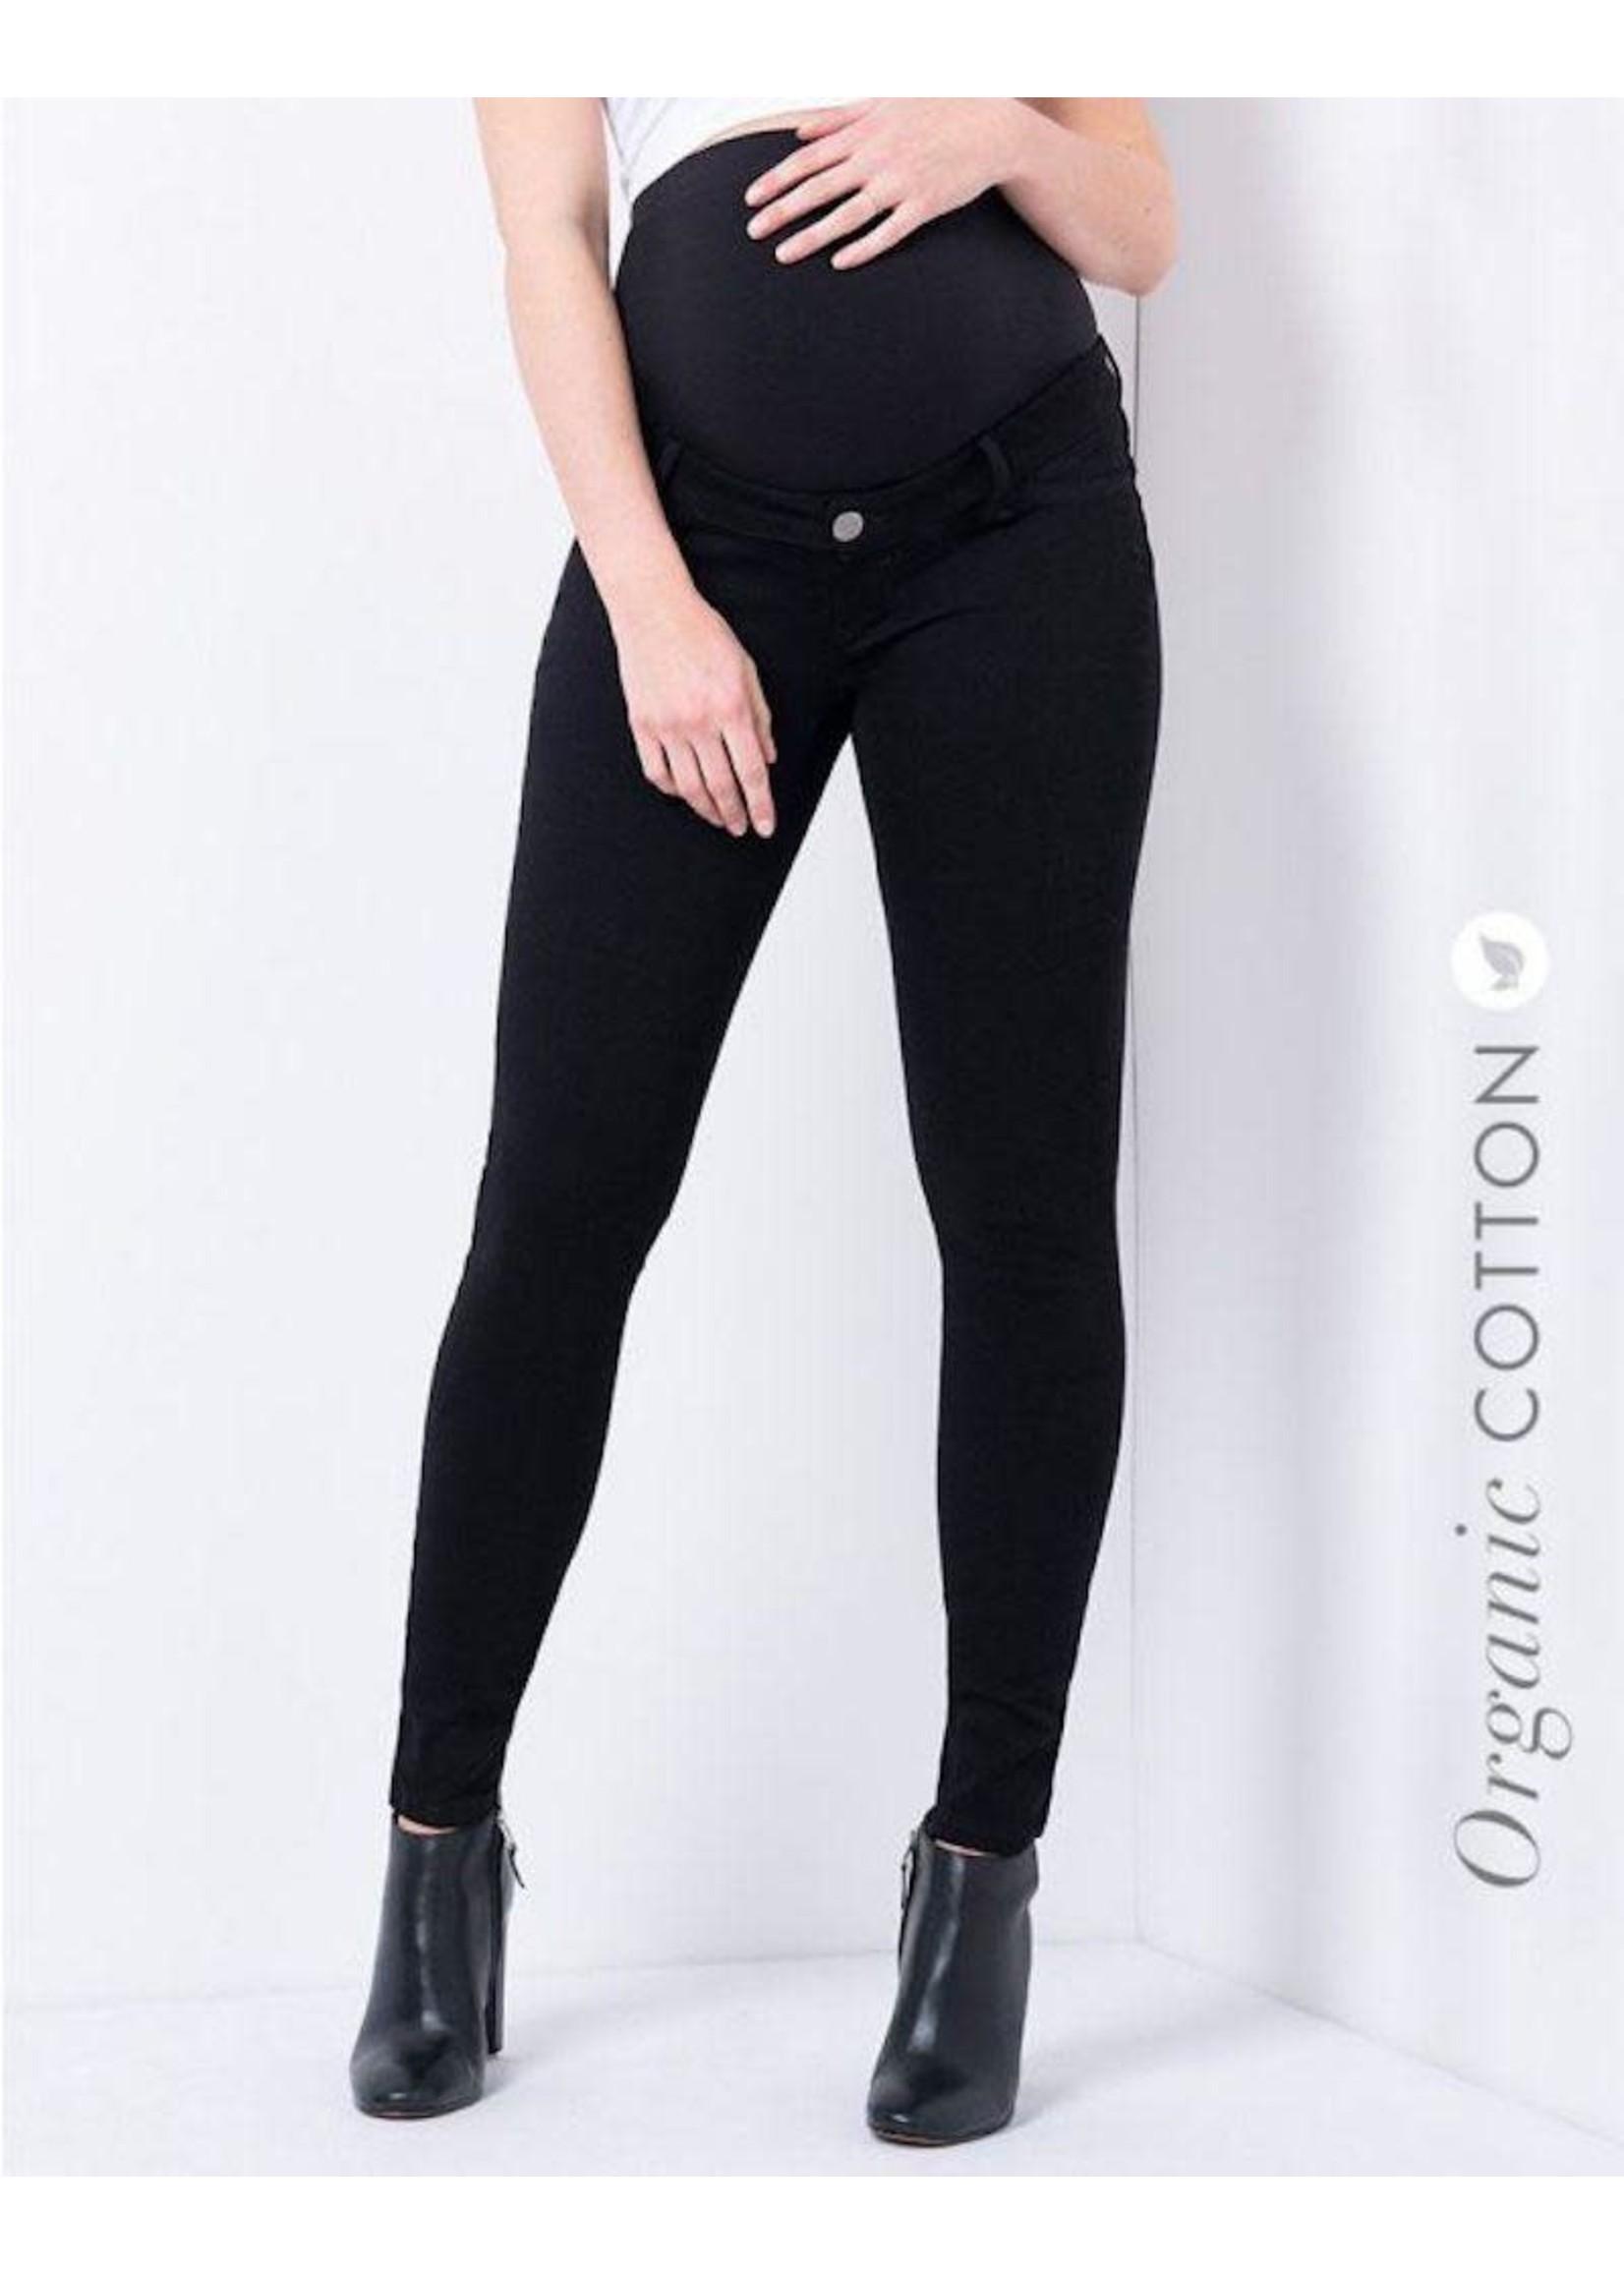 Seraphine Seraphine, Freddie, Organic Cotton Over Bump Maternity Jeans